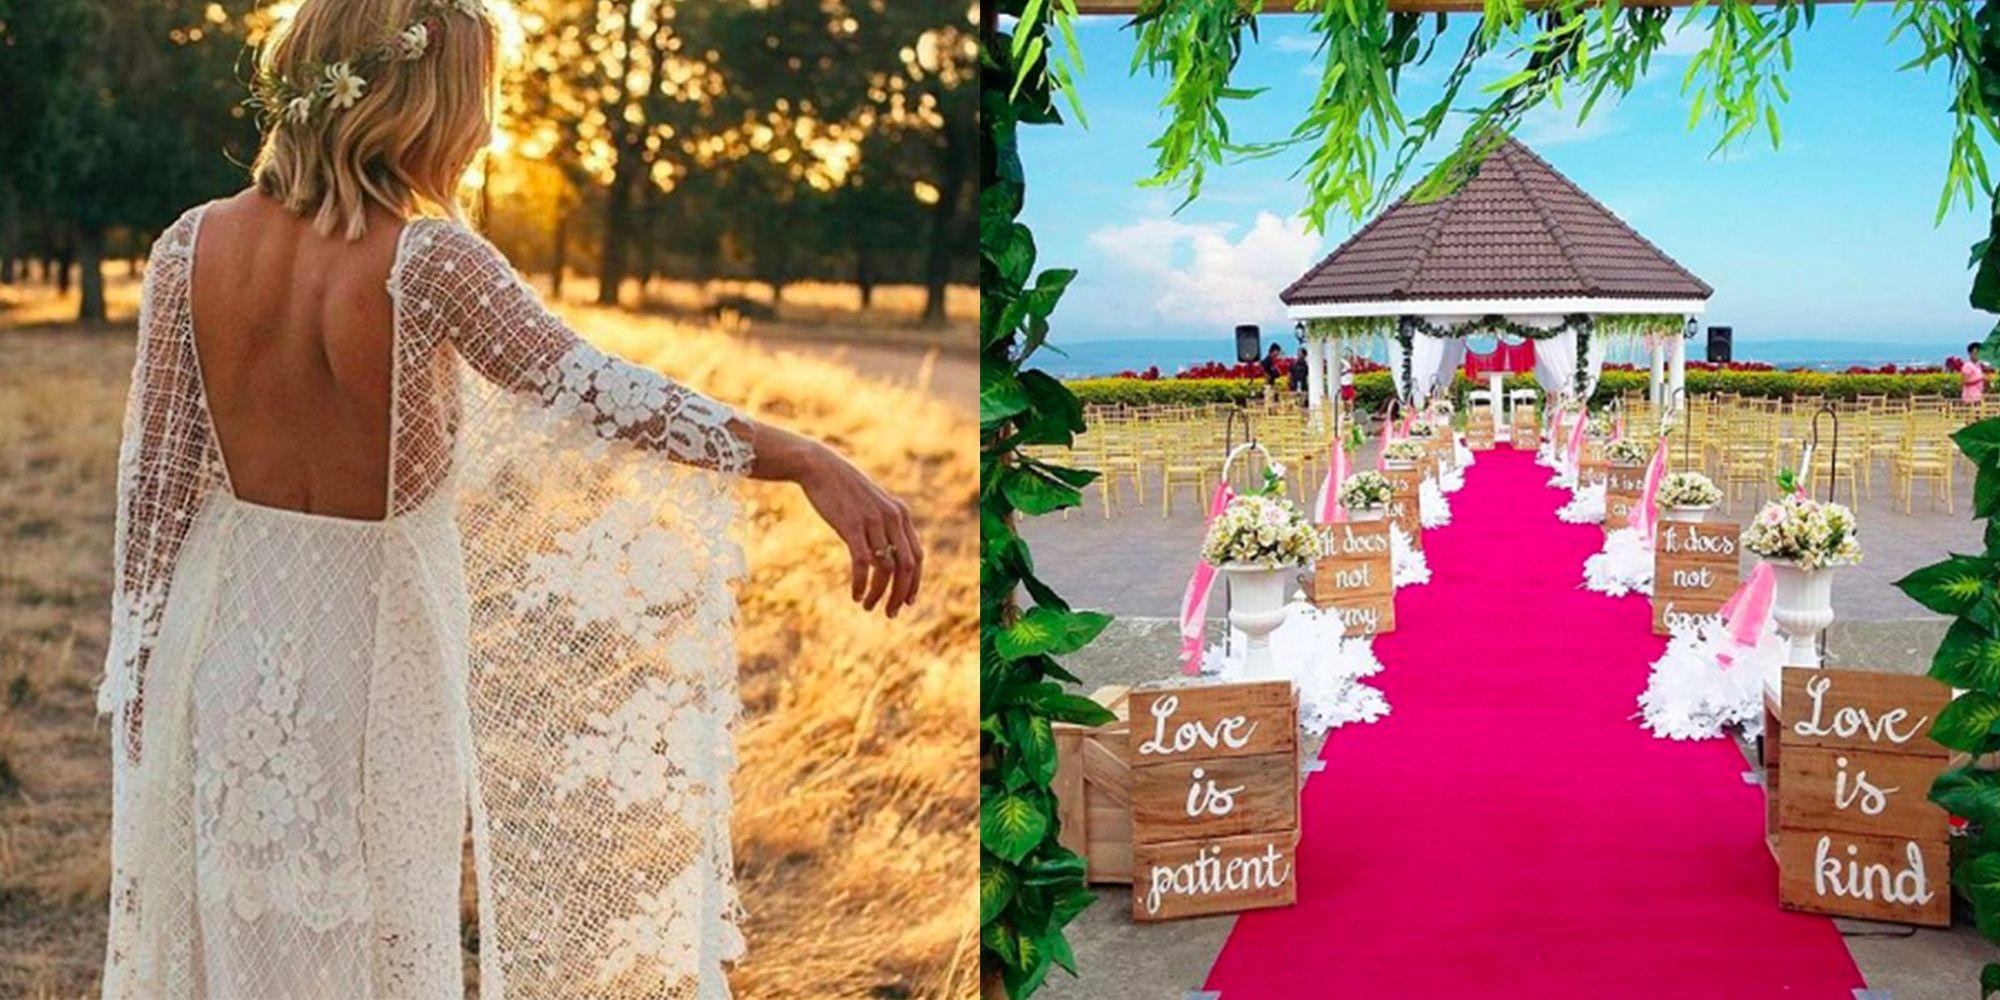 Matrimonio Tema Boho Chic : Decorazioni boho chic per il matrimonio foto nanopress donna